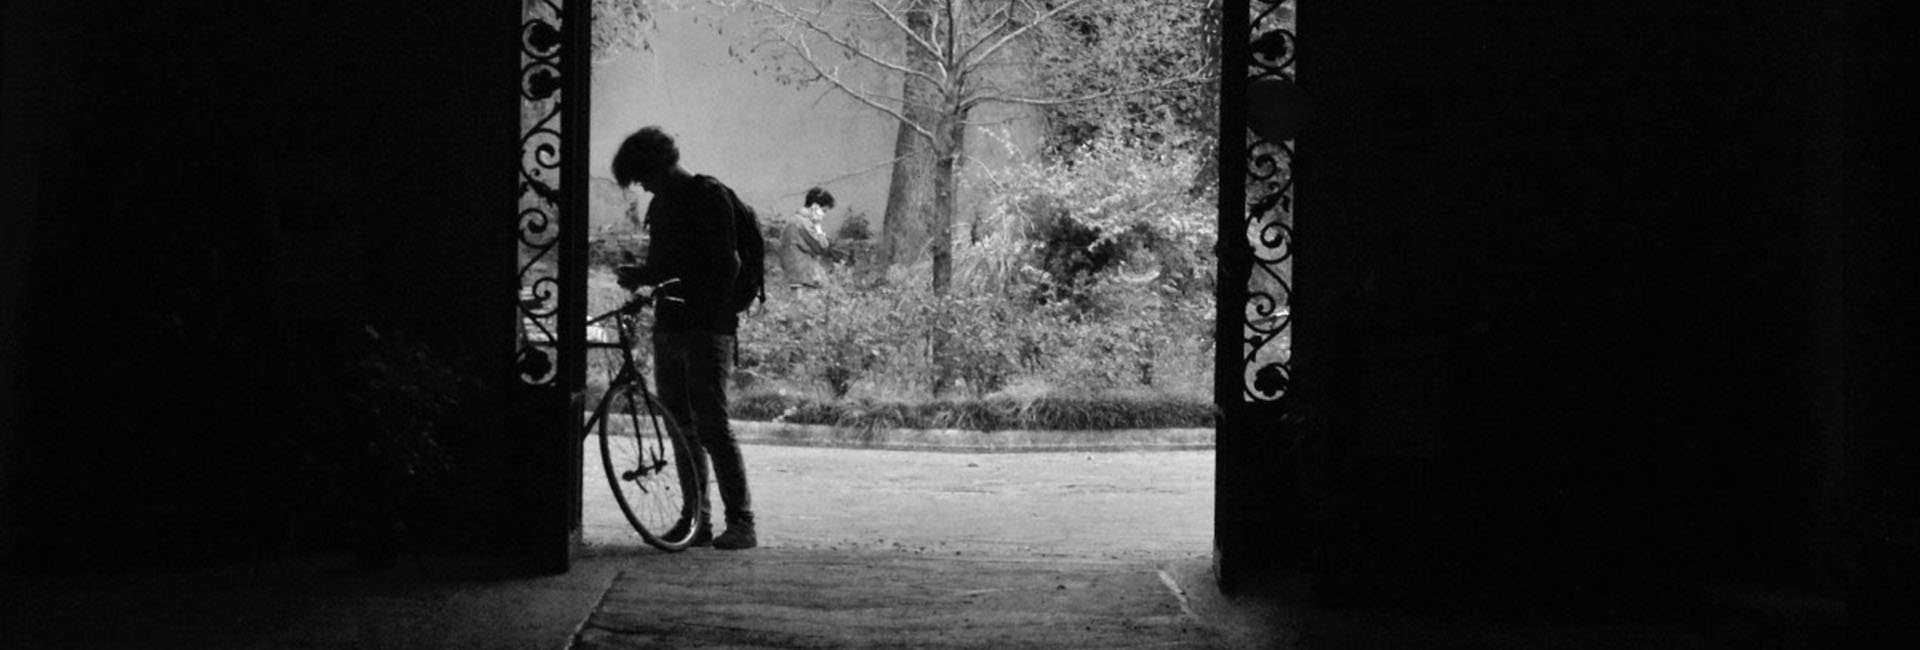 Padova Travel Bike ©Elena Gasparini